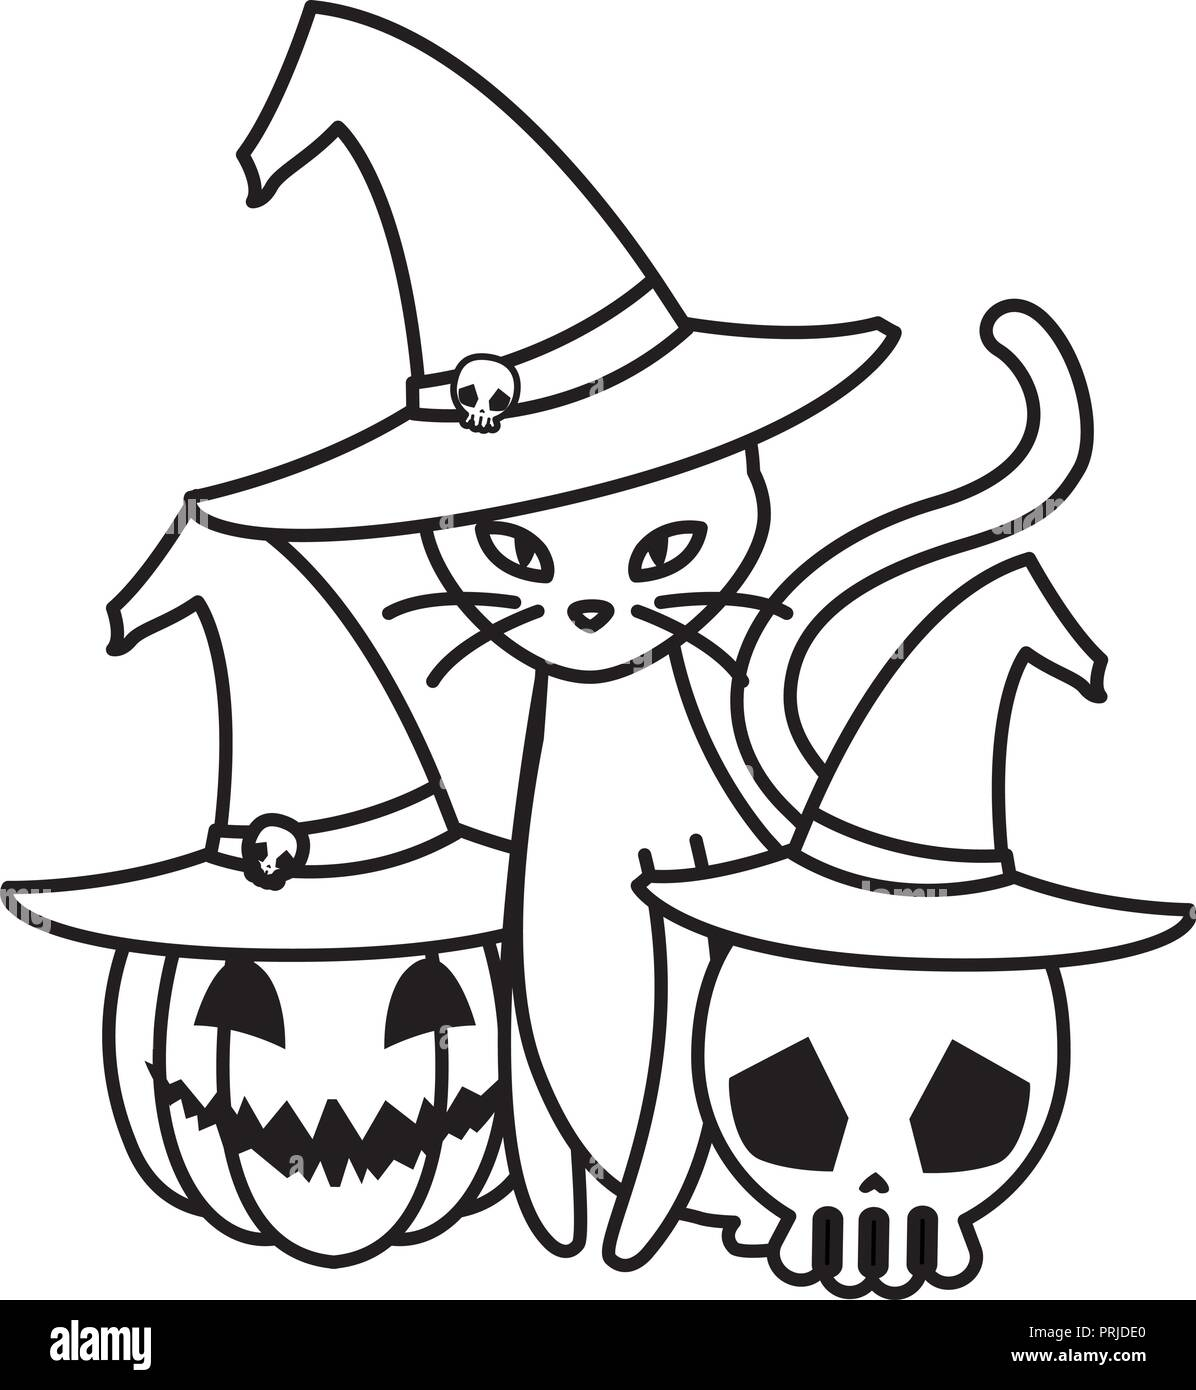 halloween black cat with pumpkin and skull vector illustration design - Stock Image